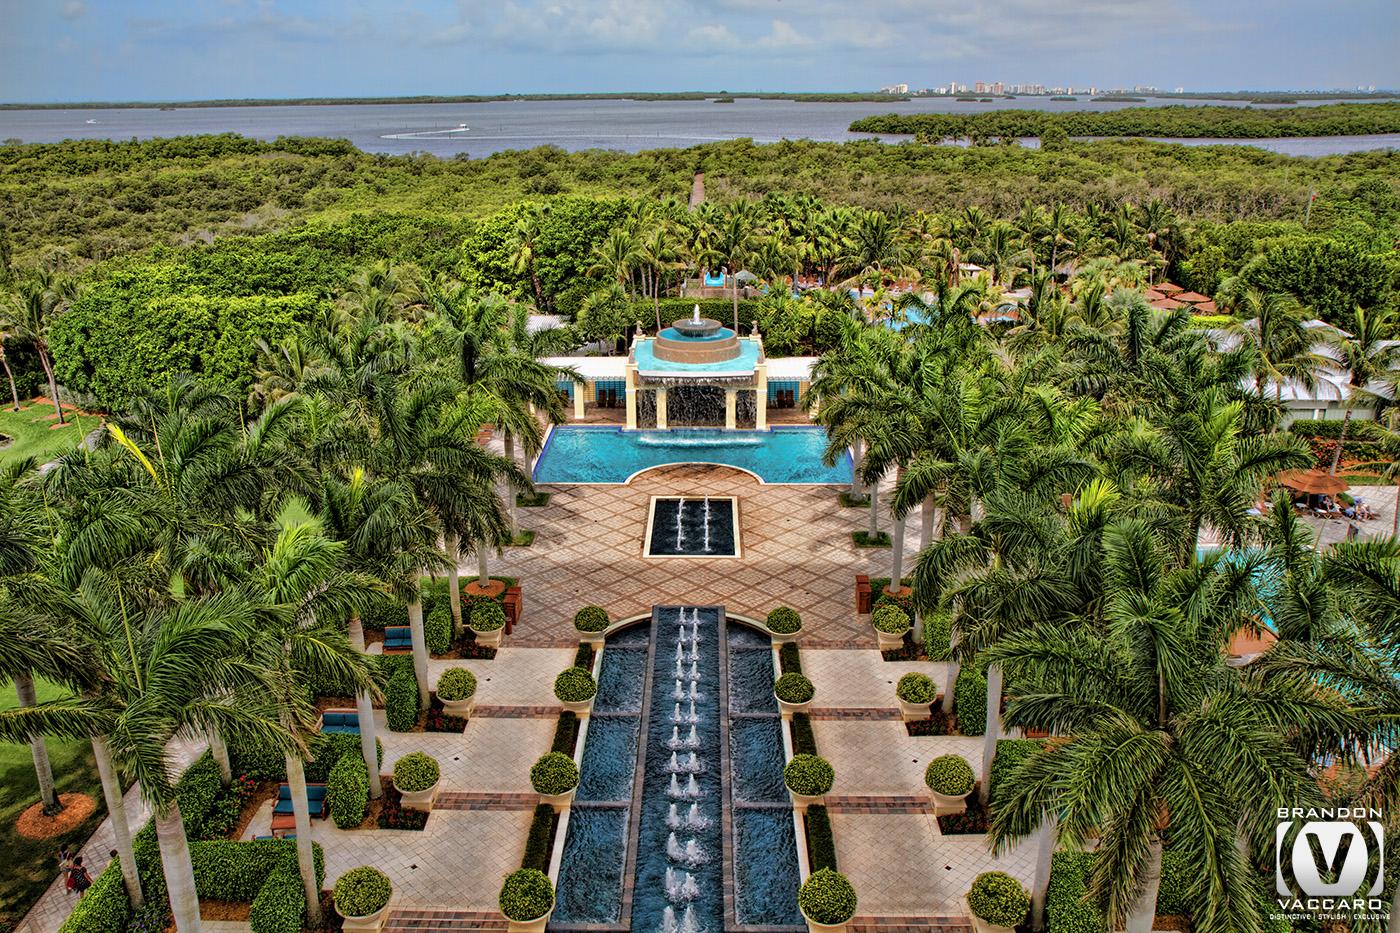 architecture-hyatt-hotel-florida-commercial-photography-.jpg